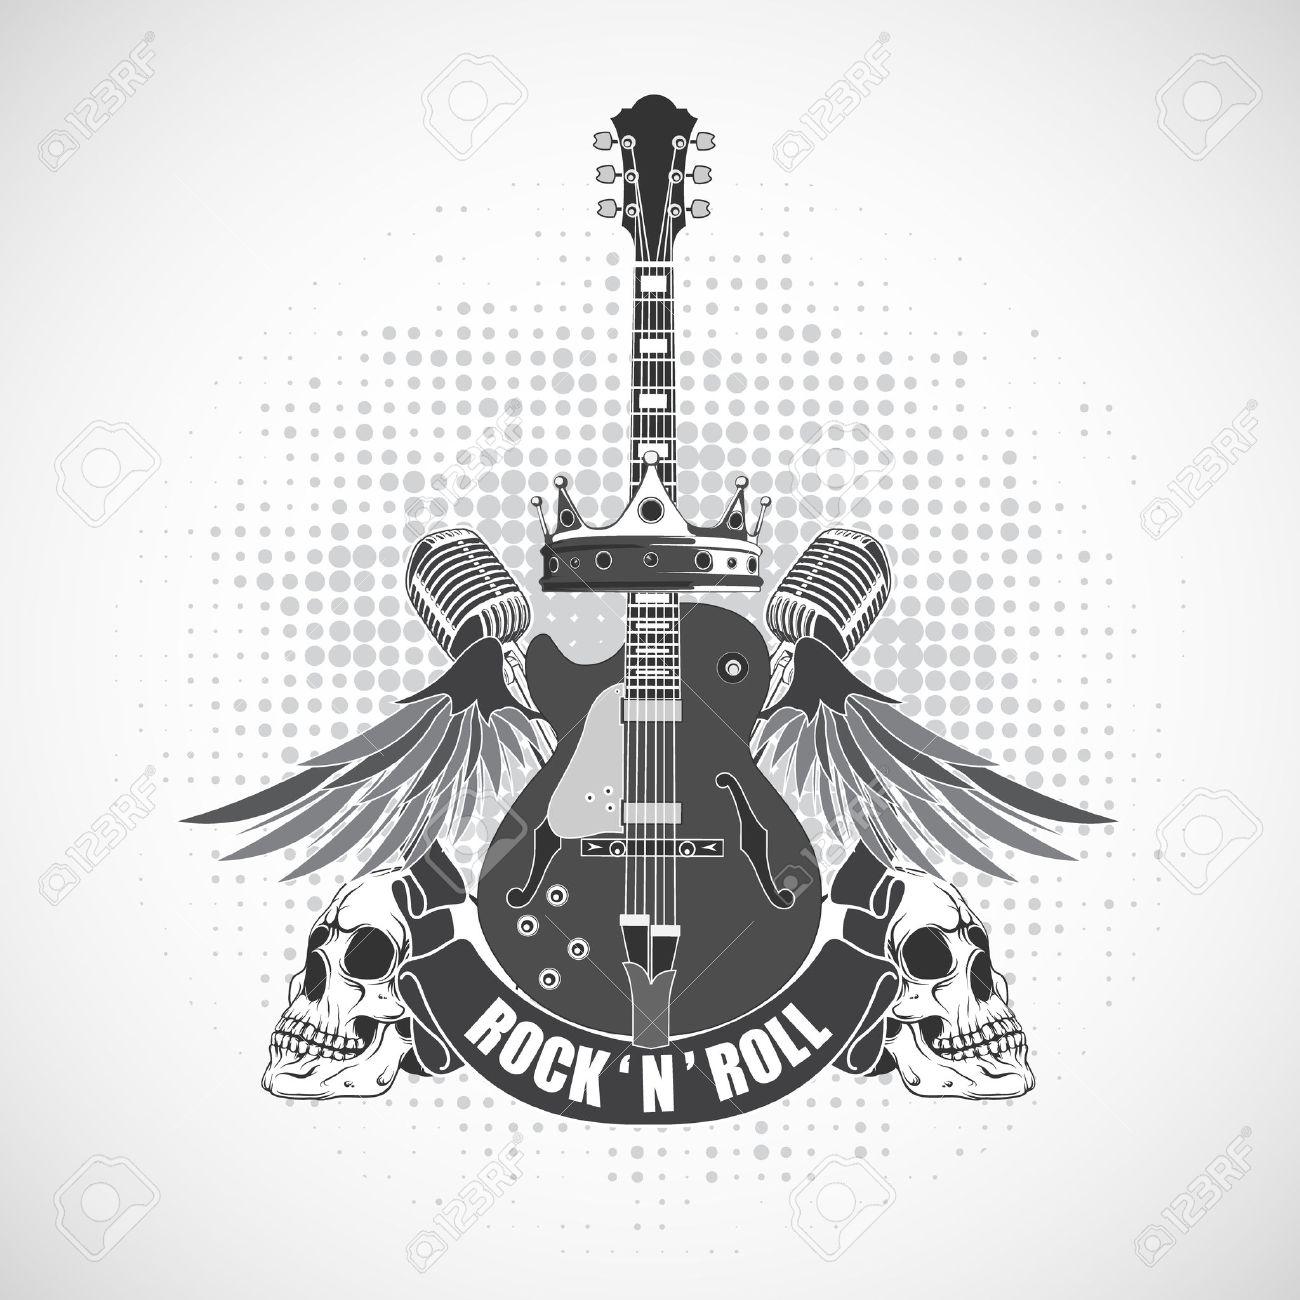 The vector image rock n roll symbol royalty free cliparts vectors the vector image rock n roll symbol stock vector 37494601 buycottarizona